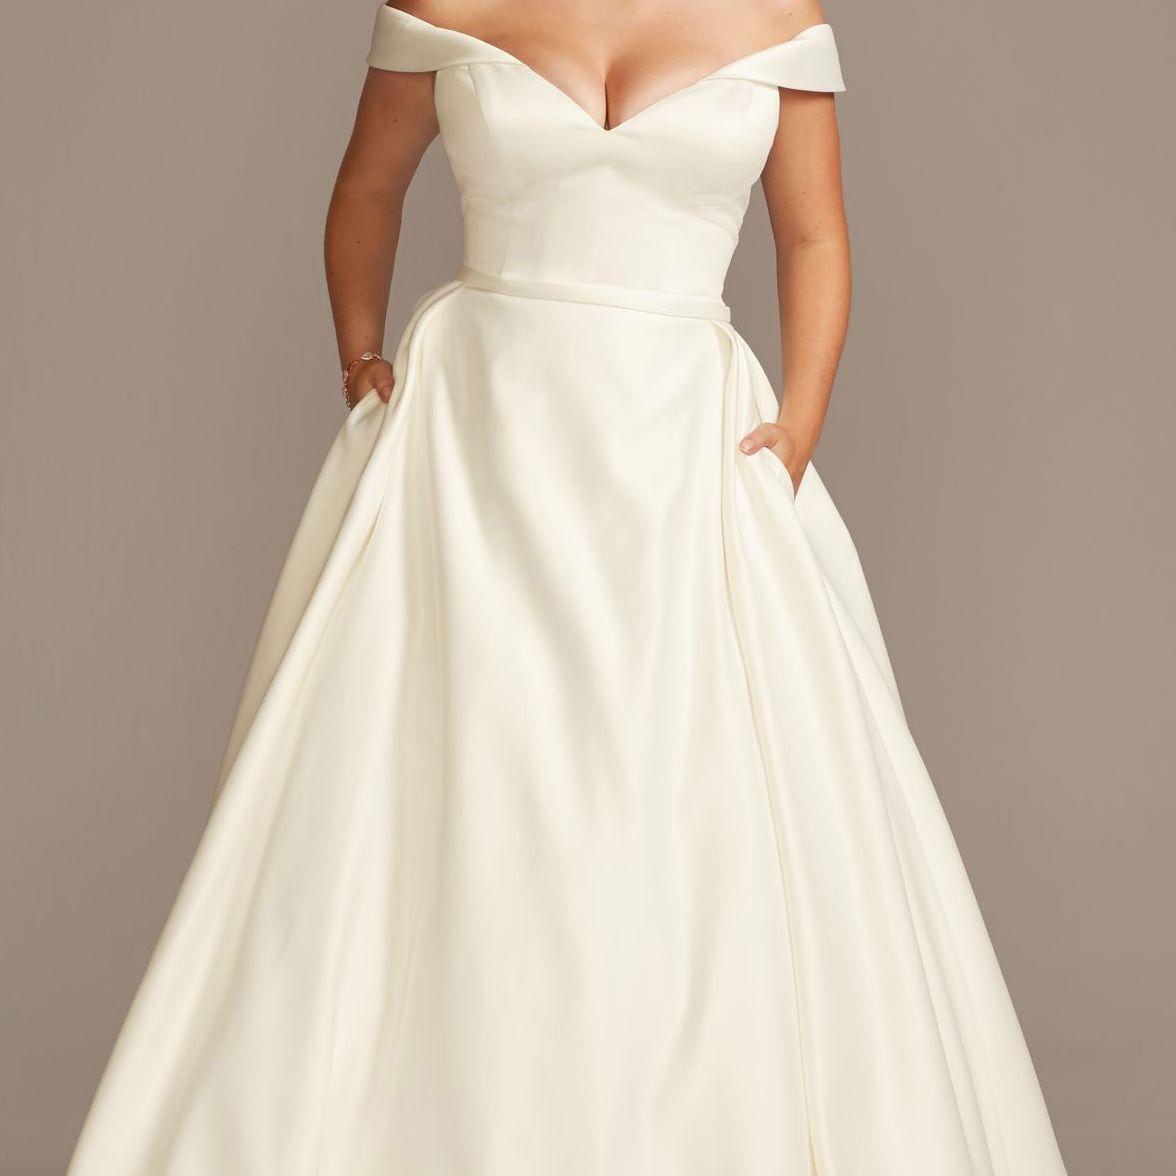 The 27 Best Plus Size Wedding Dresses Of 2020,Short Royal Blue Dress For Wedding Guest